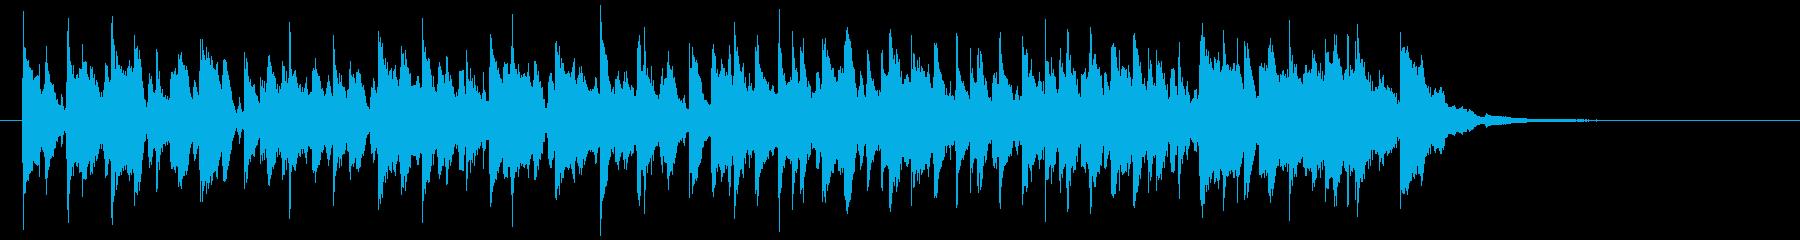 CM用13/ショート、陽気なキッズ向けの再生済みの波形